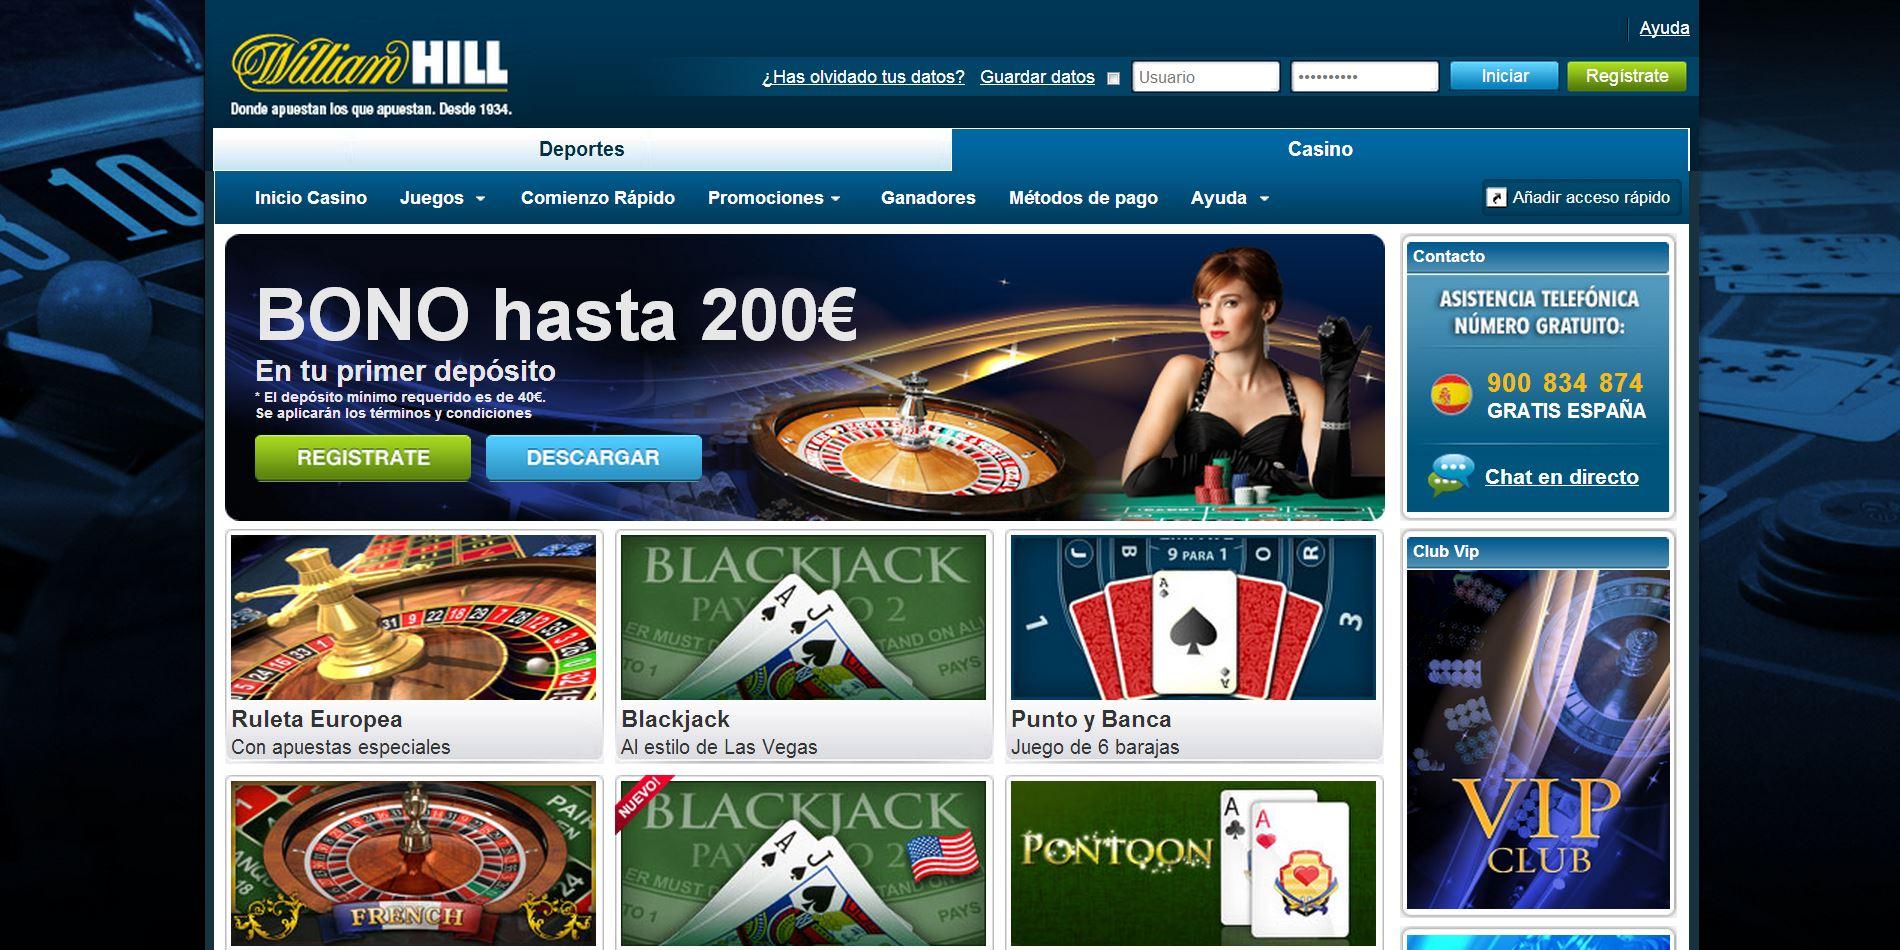 William hill 10 gratis los mejores casino online España-404735